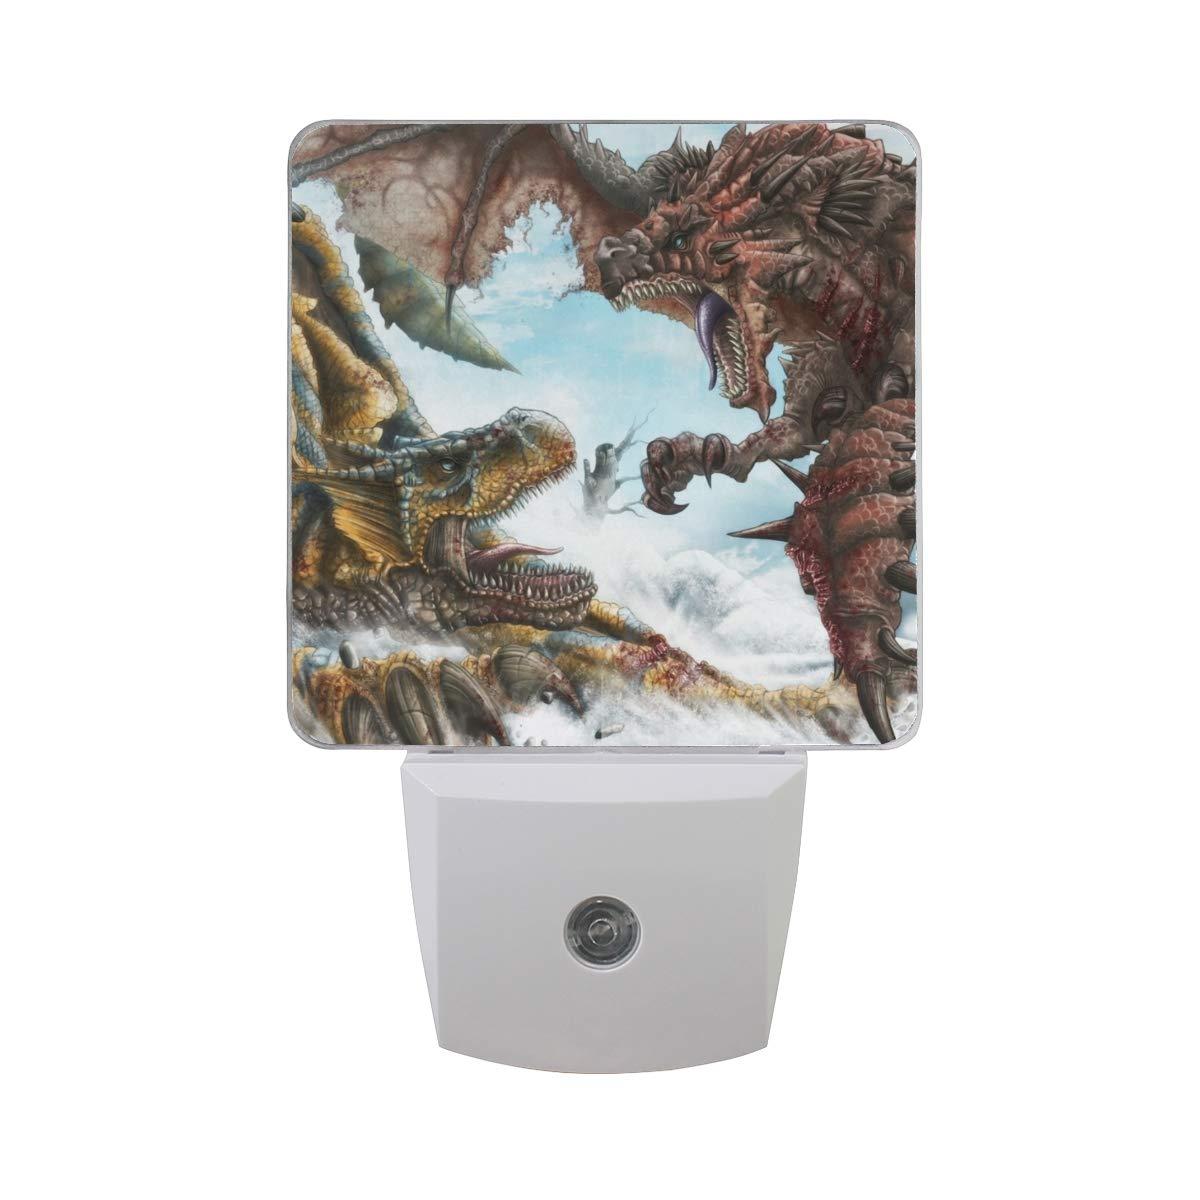 Night Light Dinosaur WAR Led Light Lamp for Hallway, Kitchen, Bathroom, Bedroom, Stairs, DaylightWhite, Bedroom, Compact